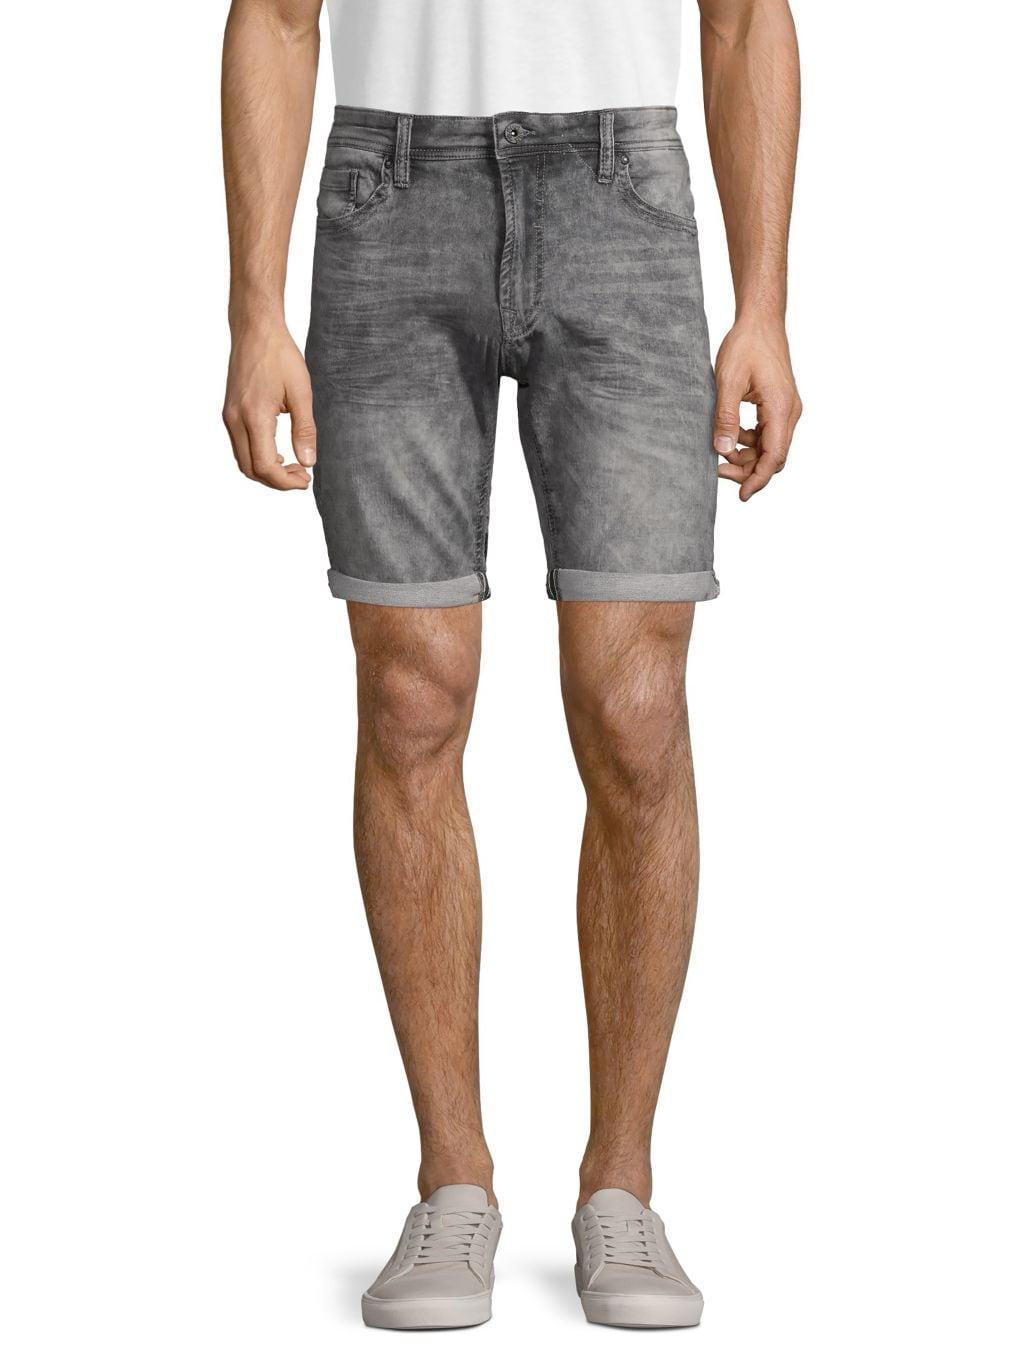 PROJEK RAW Logo Patch Denim Shorts